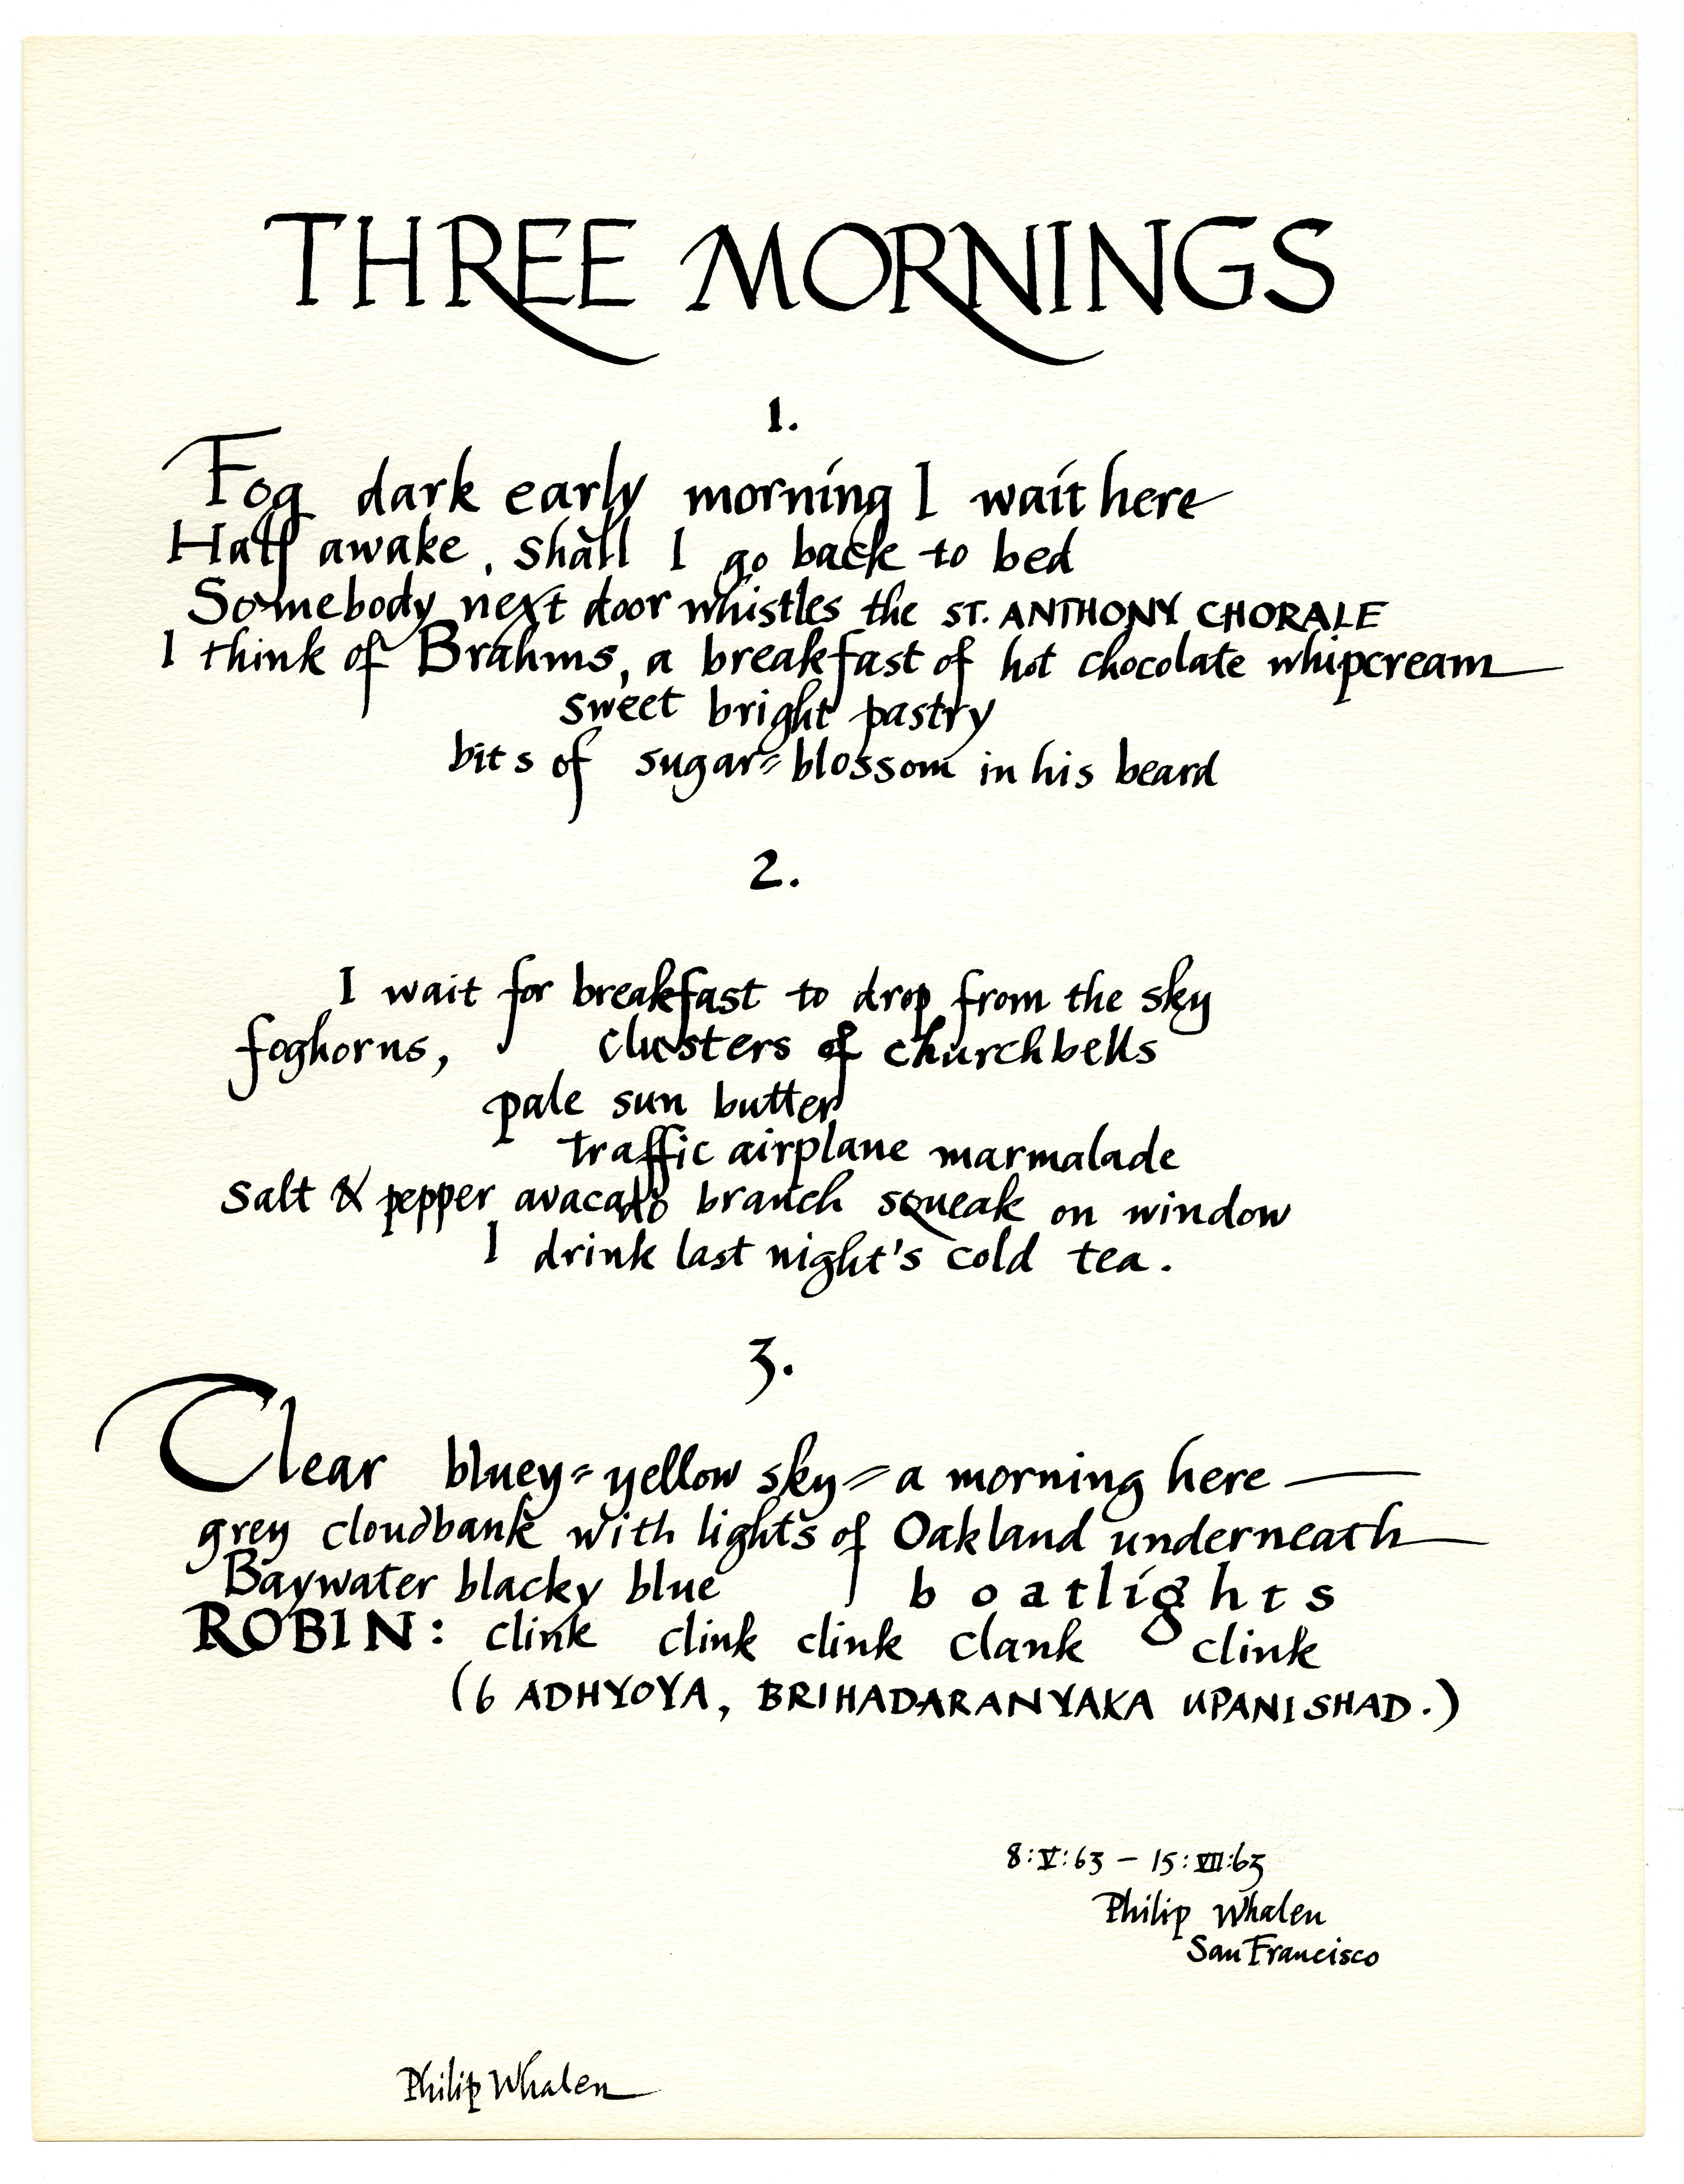 Philip Whalen. Three Mornings, 1963.